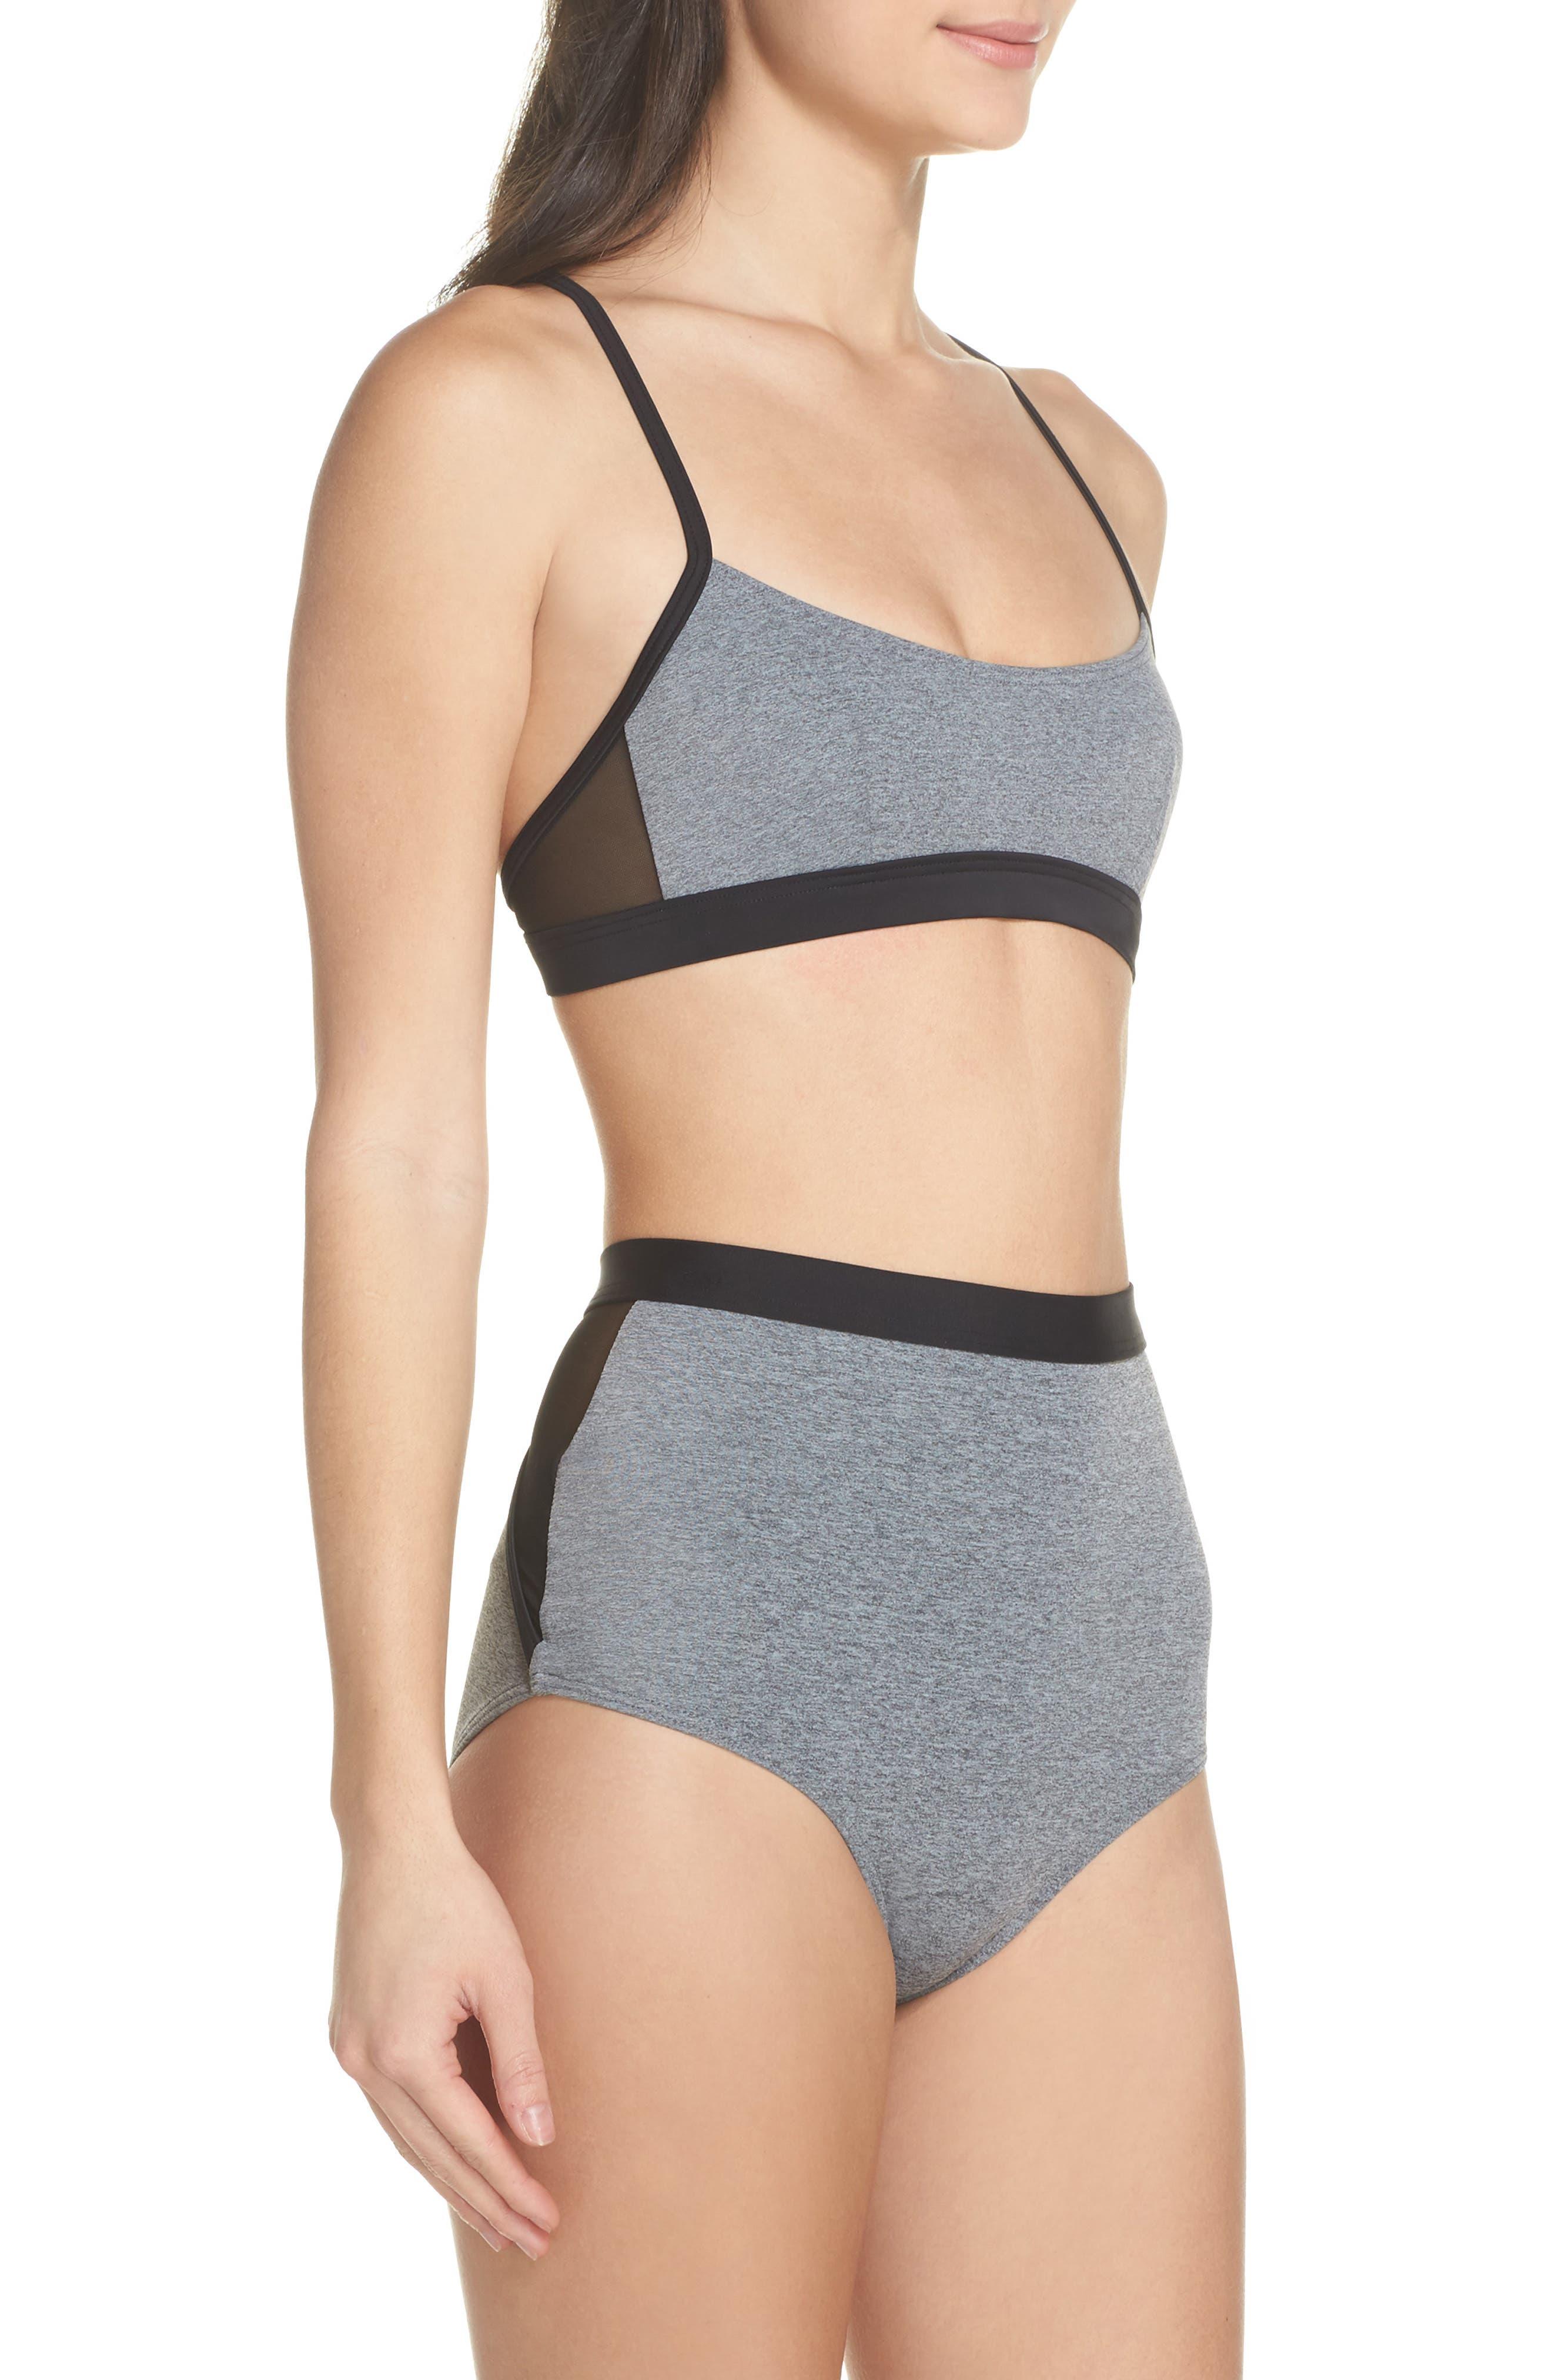 Alva Bikini Top,                             Alternate thumbnail 8, color,                             Heather Grey